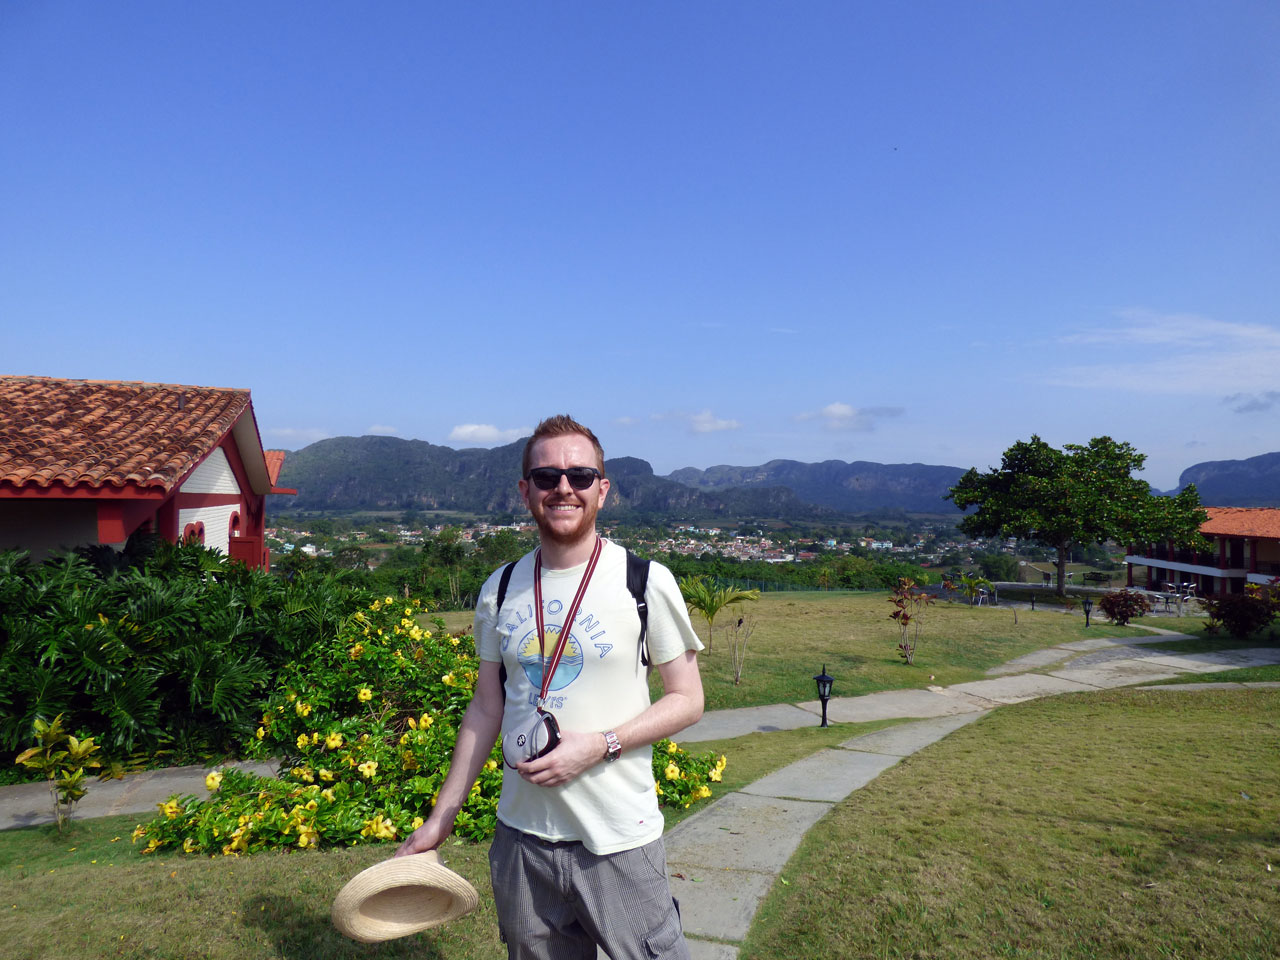 Me at La Ermita, Viñales, Cuba